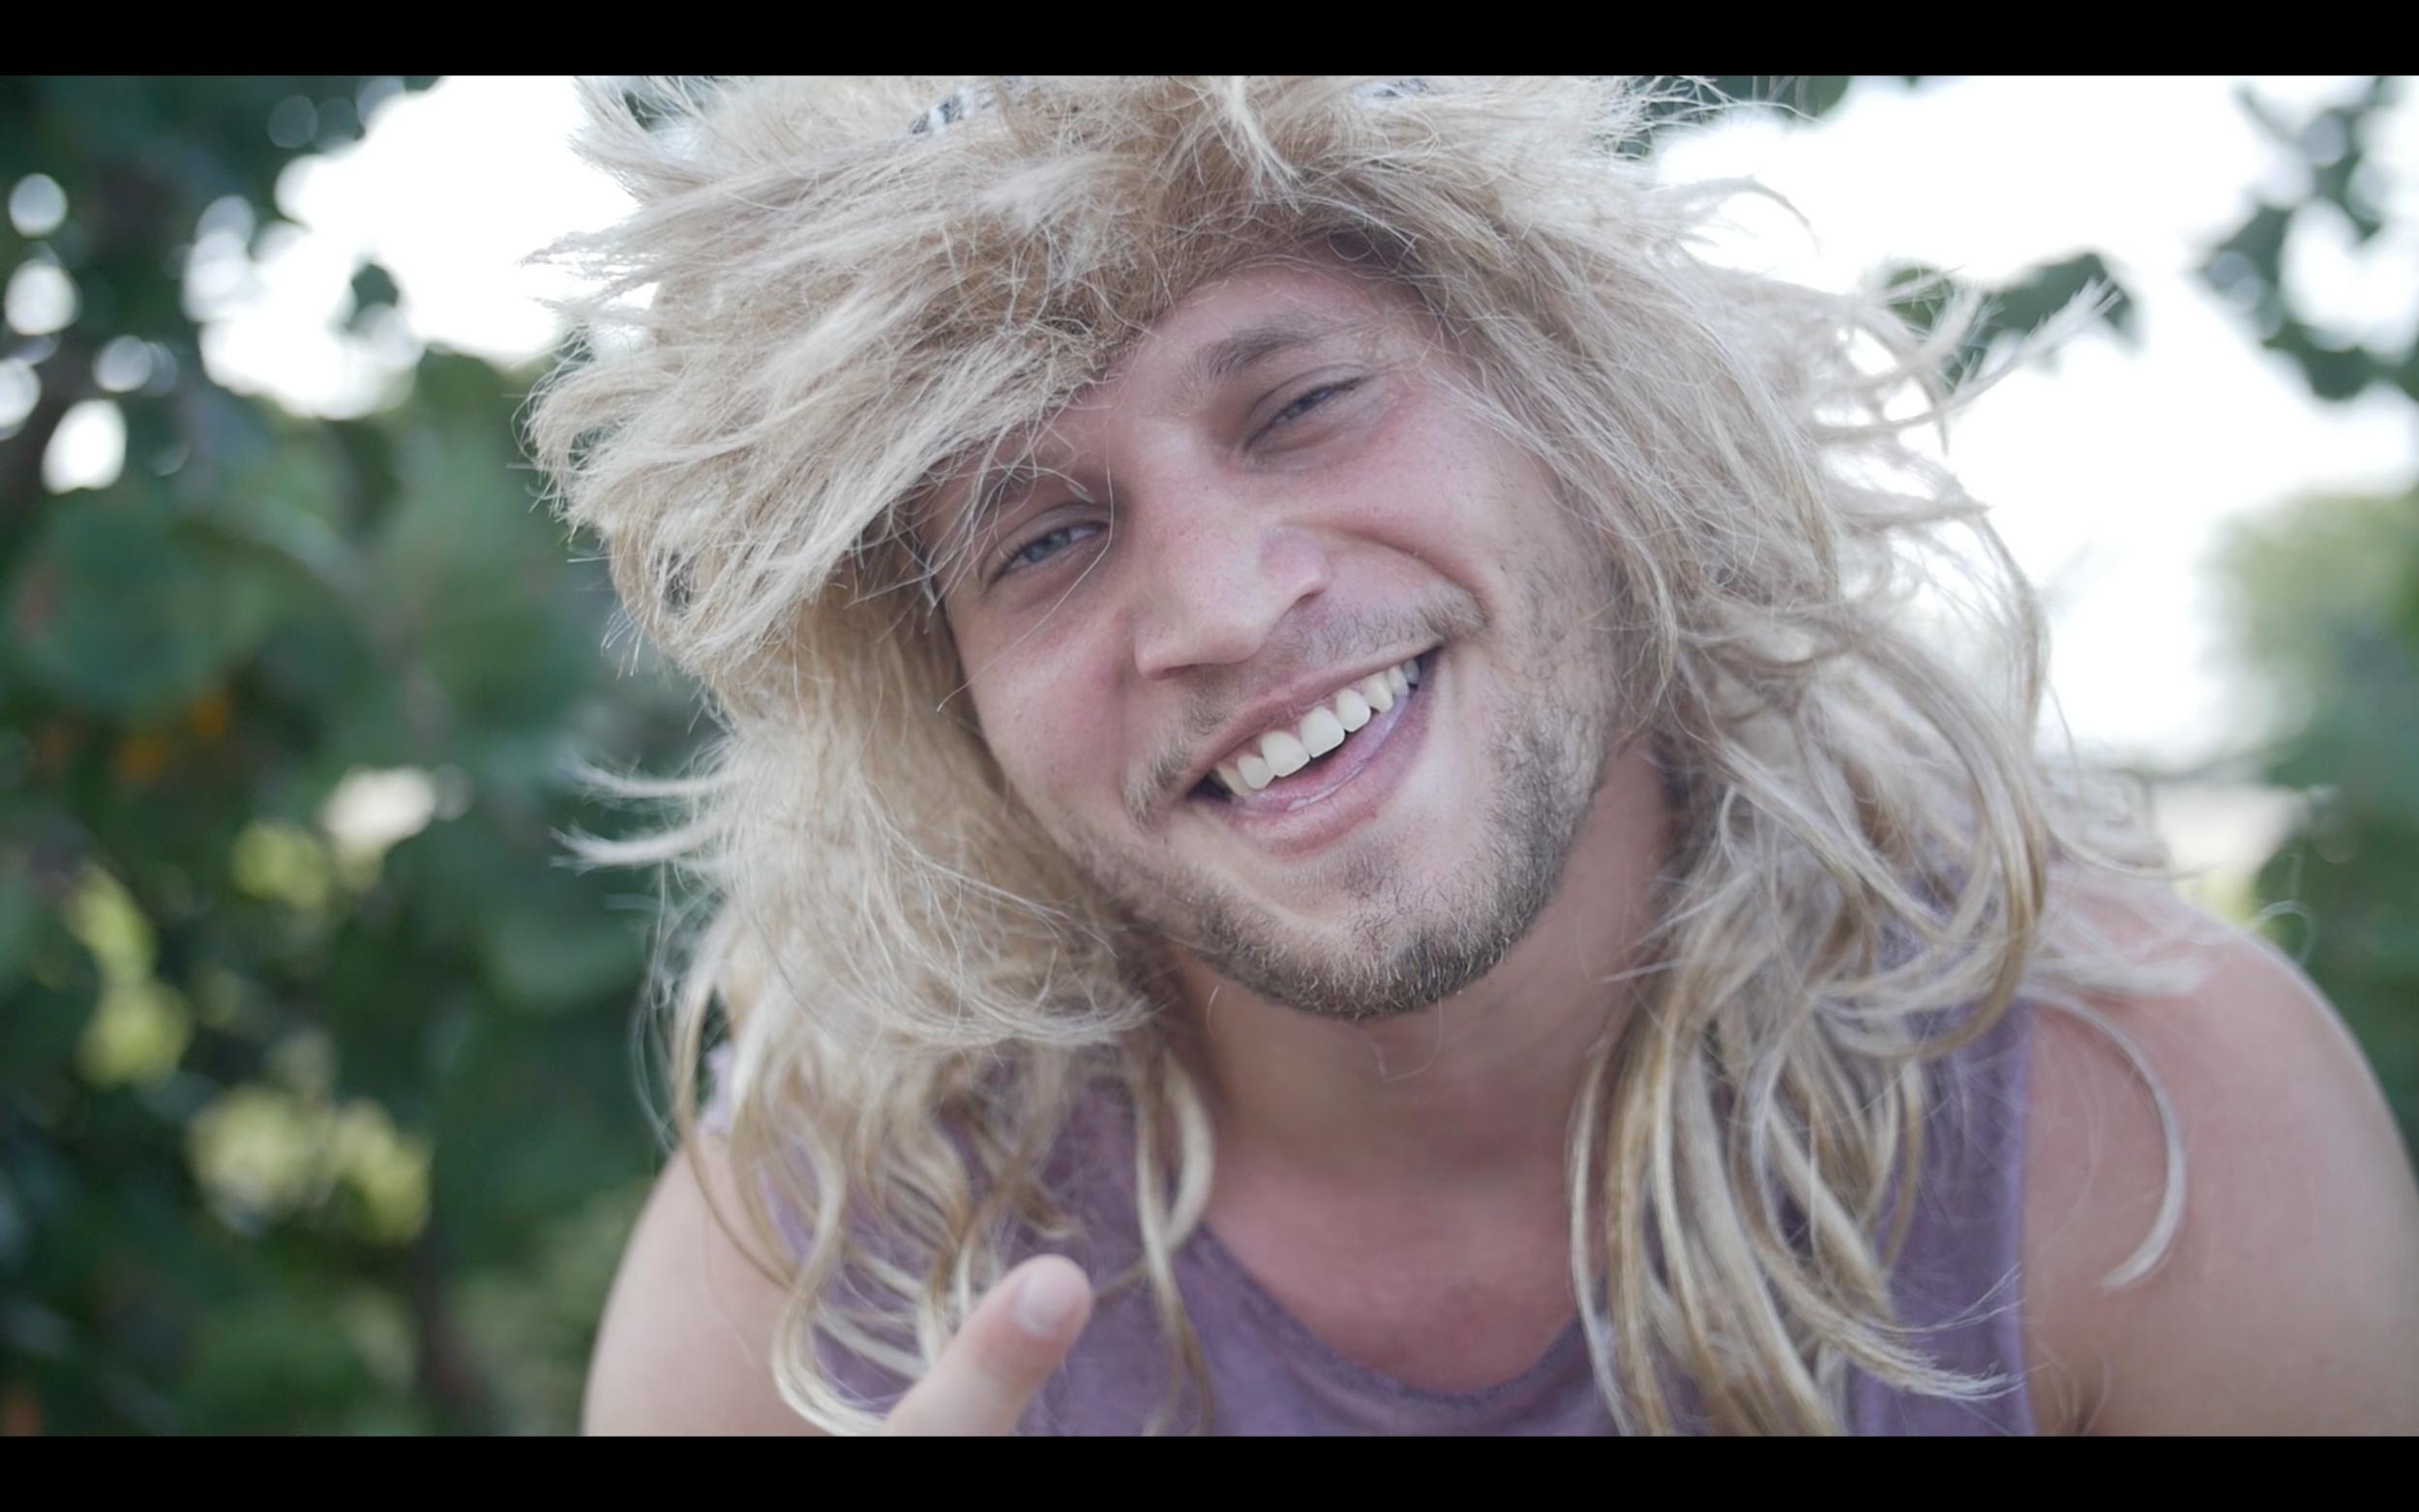 Chet - an American Ninja Warrior (Comedy)